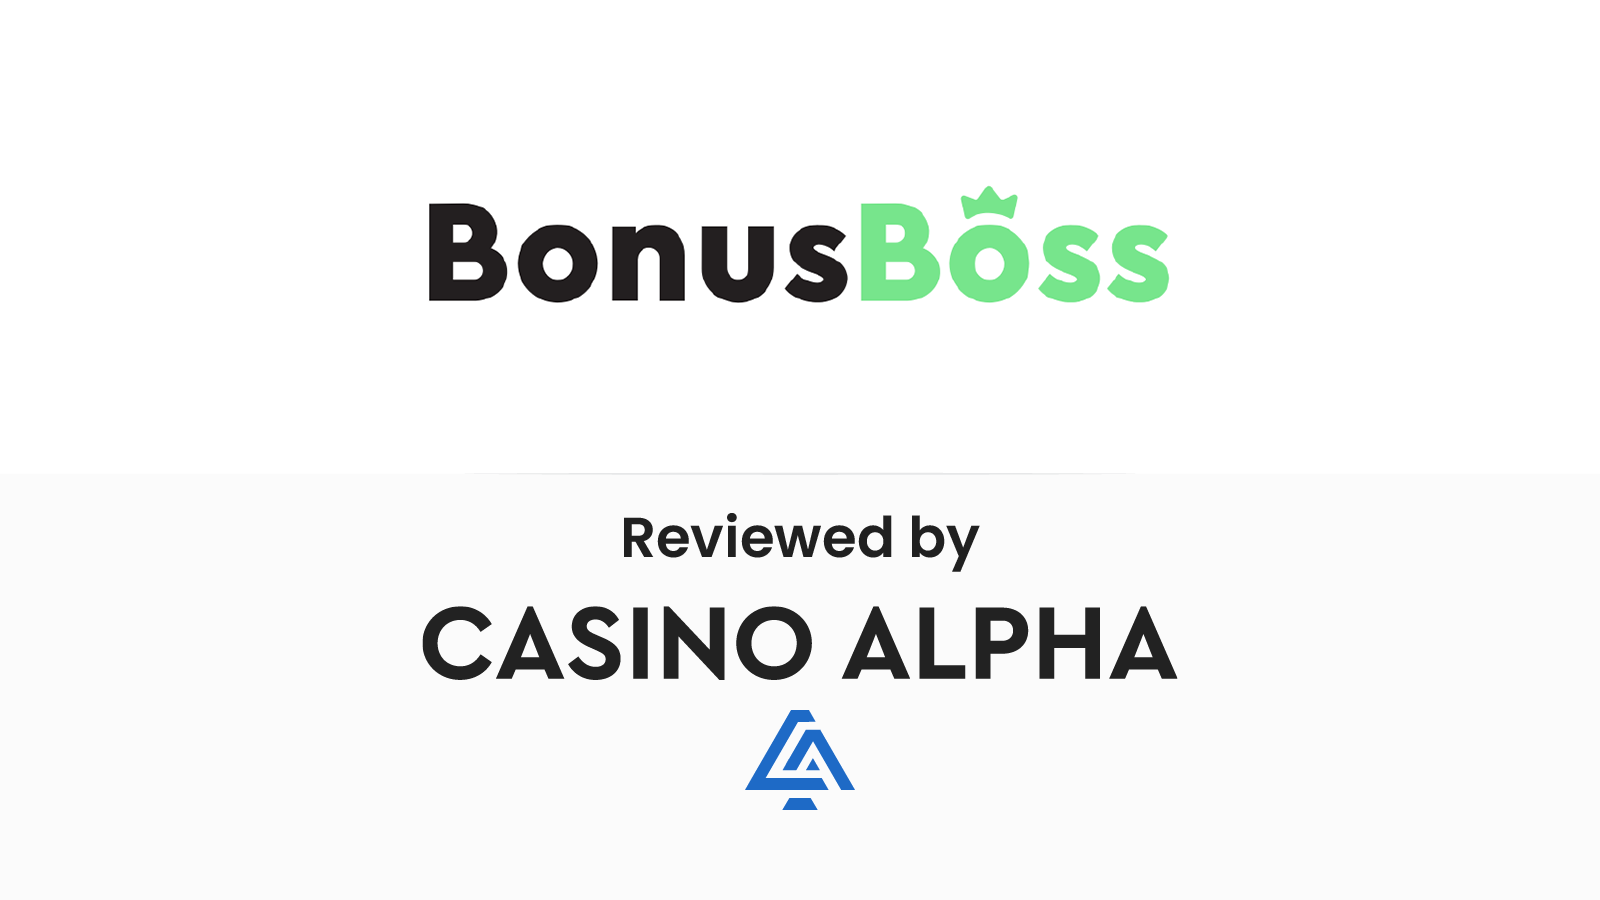 Bonus Boss Review & Promotions List